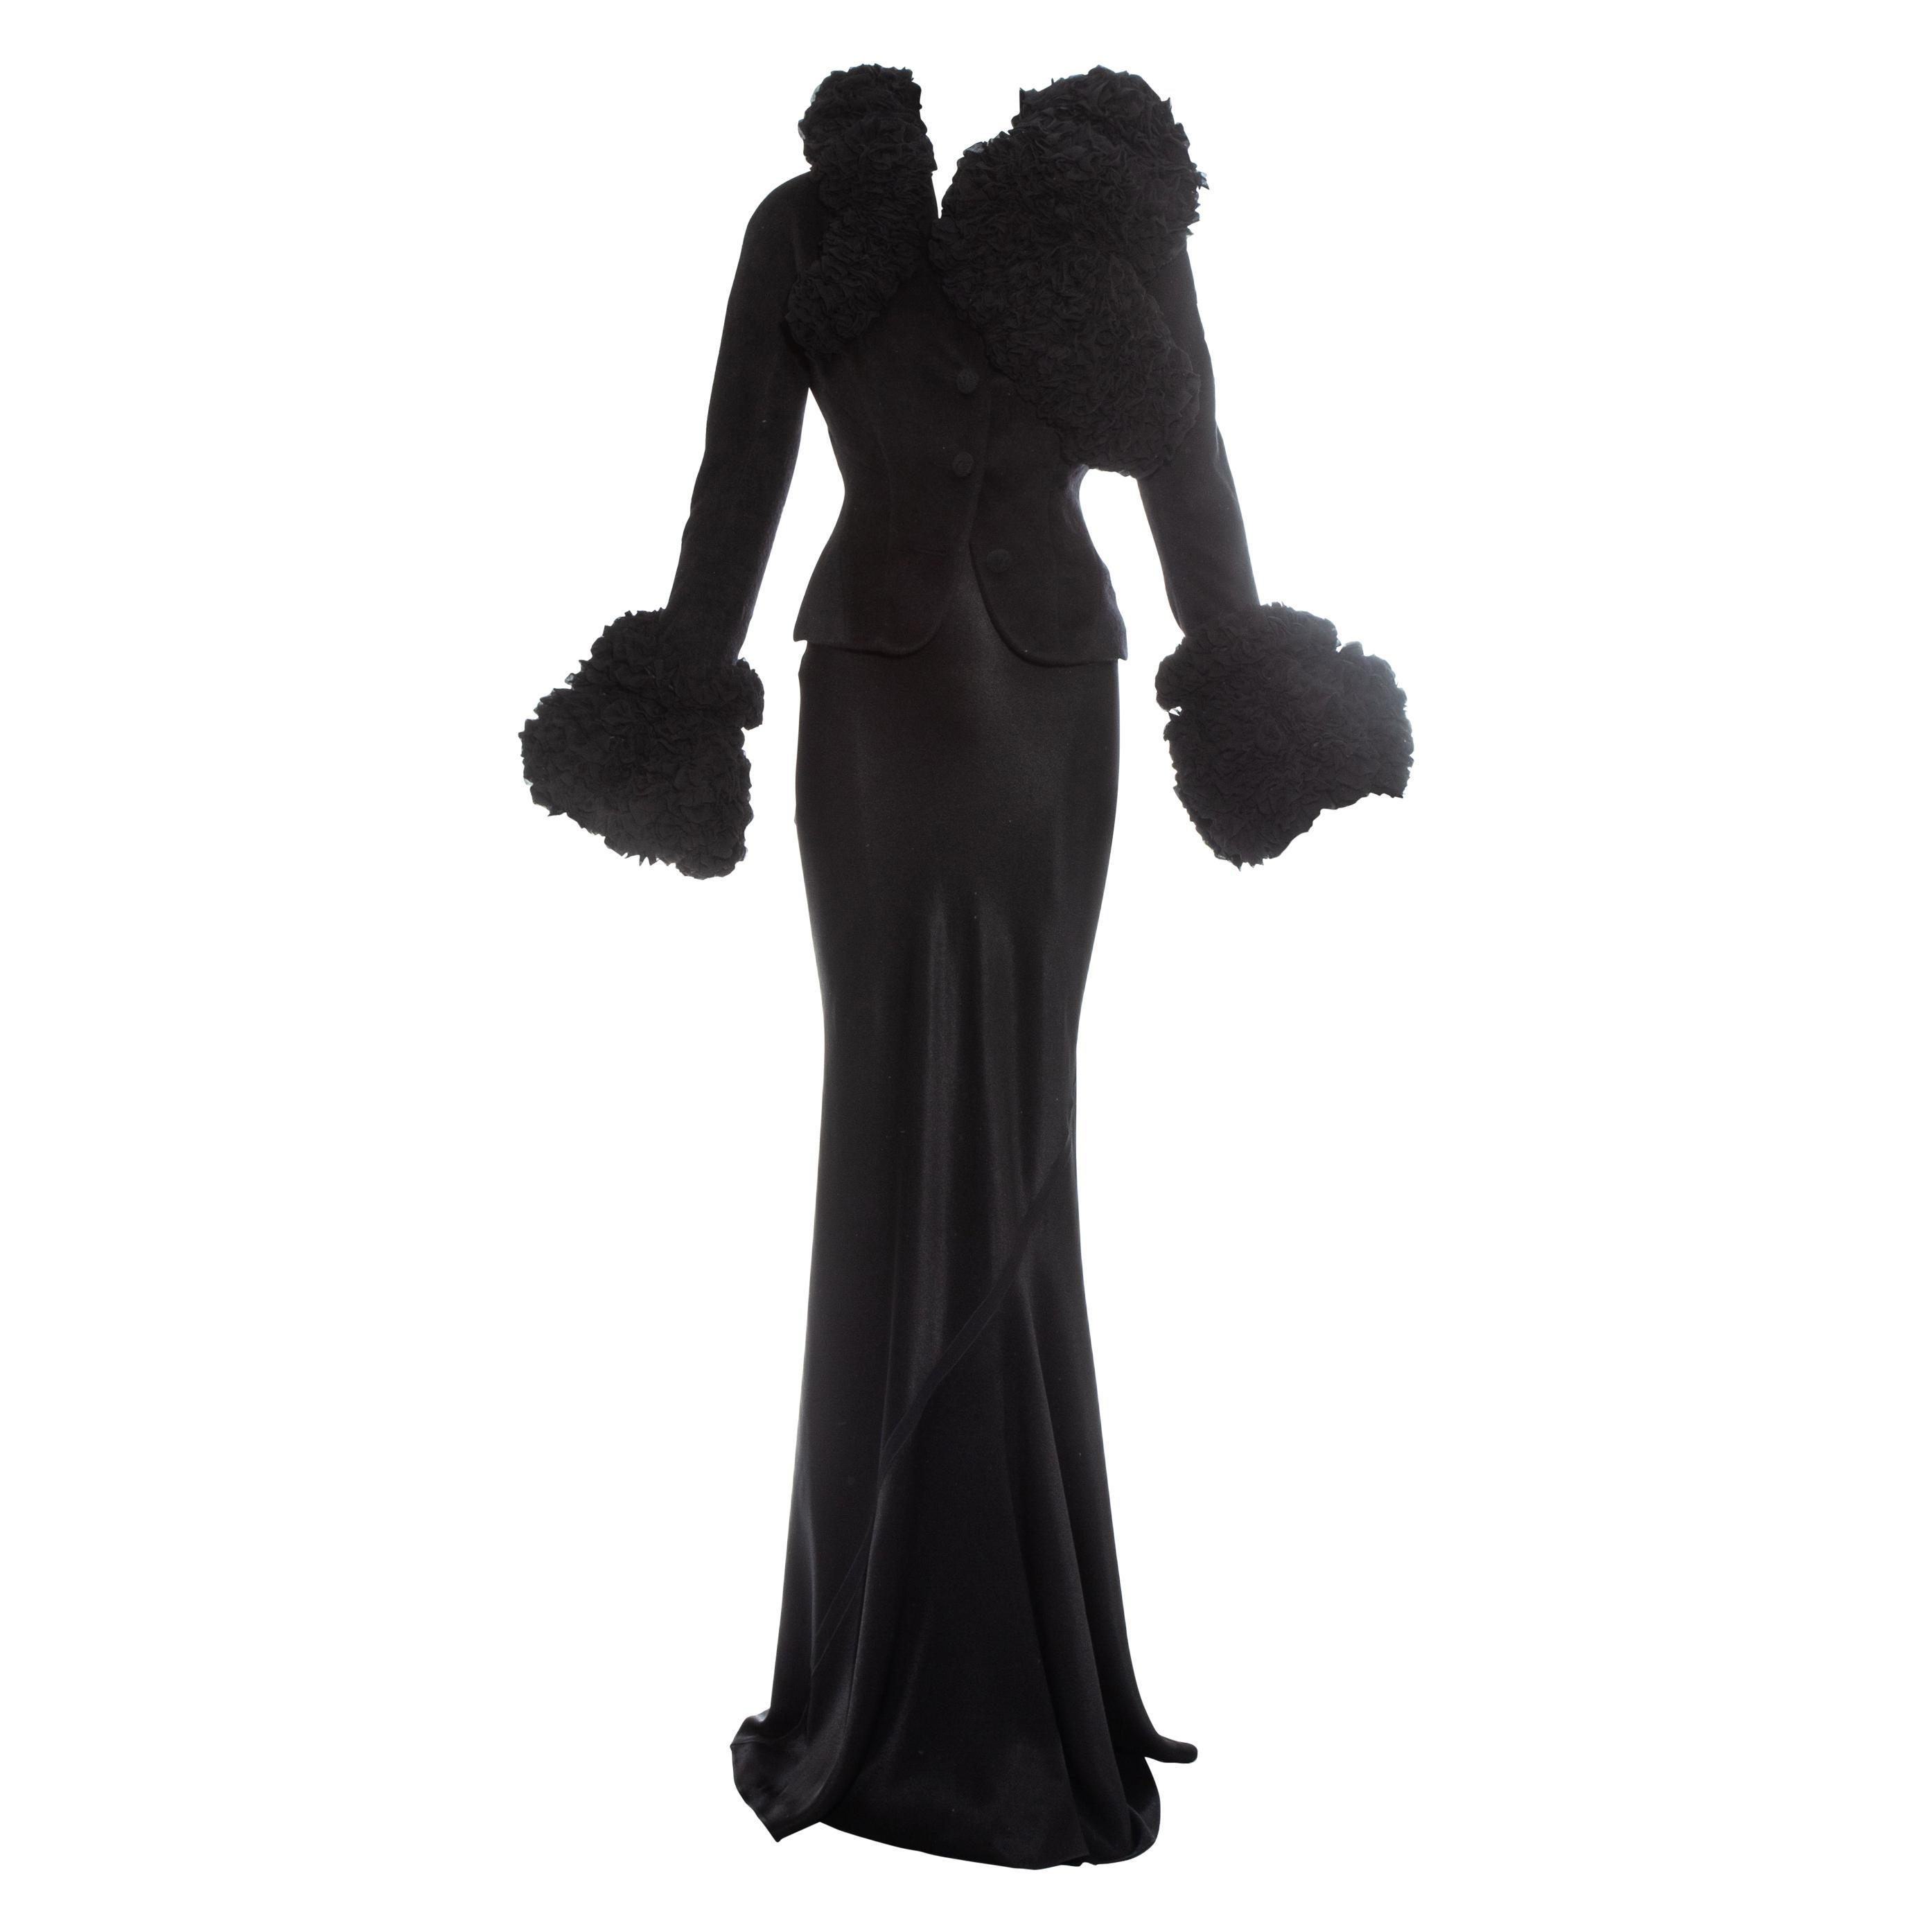 John Galliano black Angora ruffled jacket and silk skirt suit, fw 1995